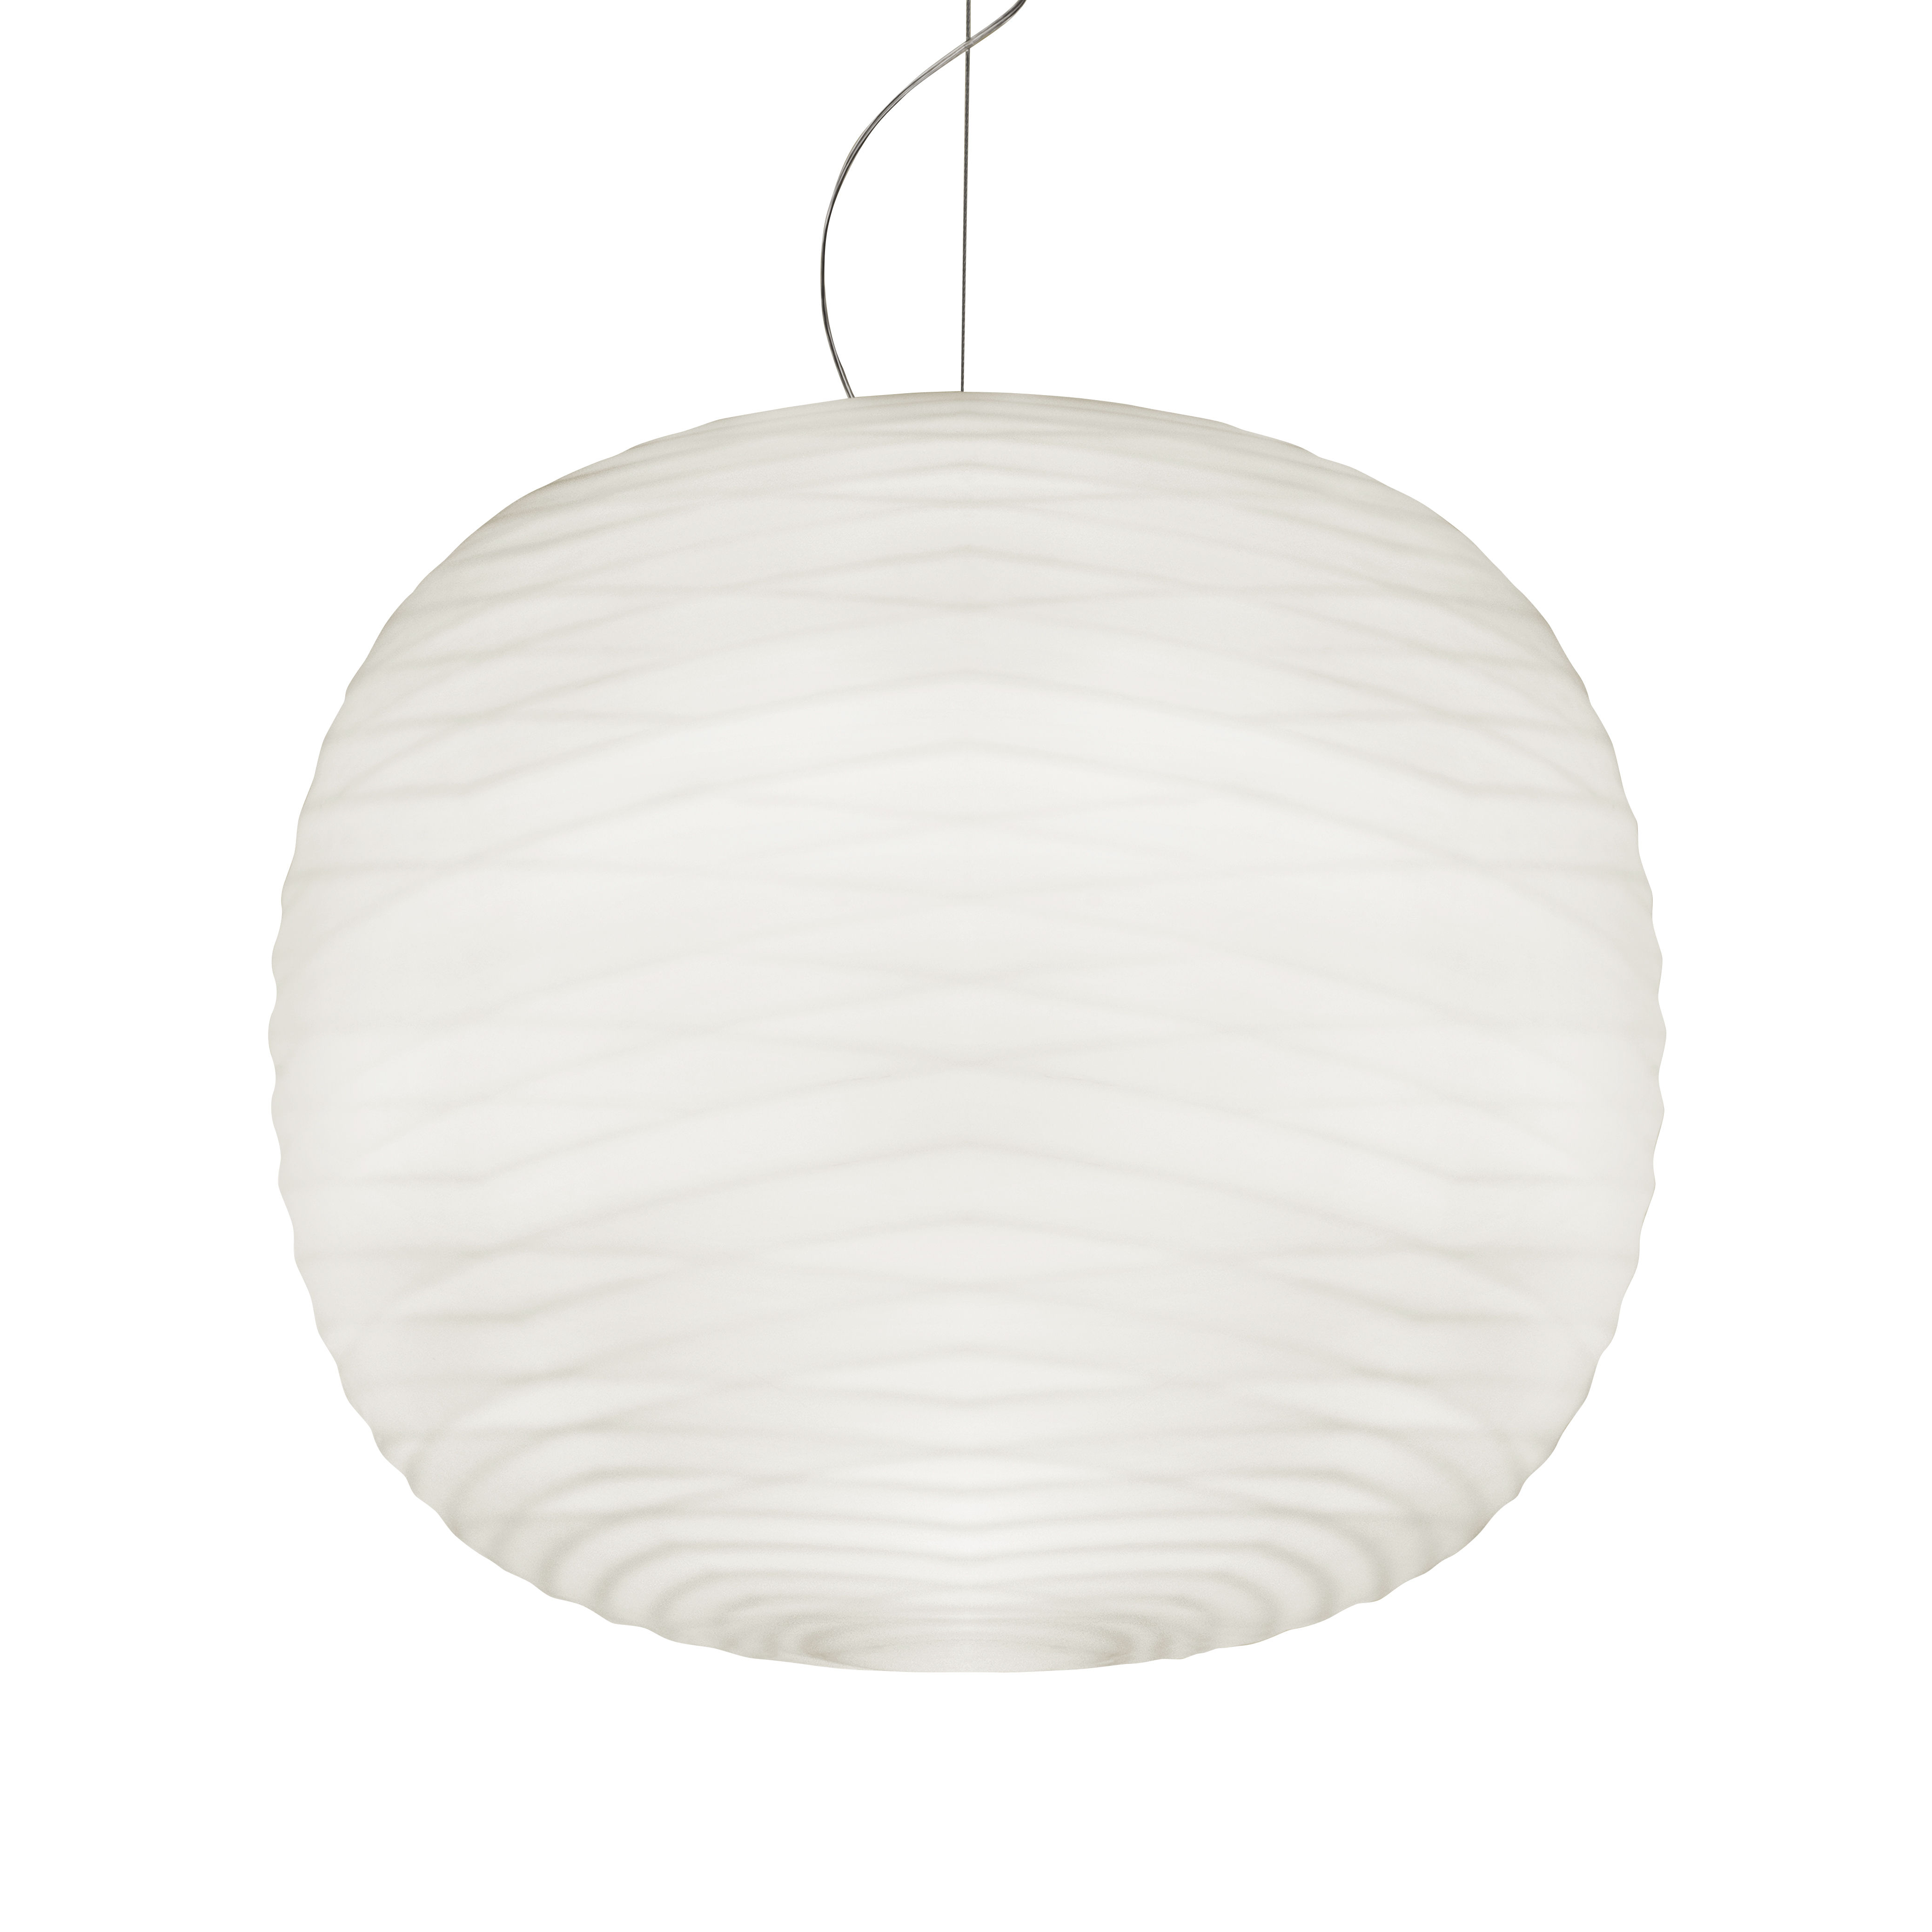 Lighting - Pendant Lighting - Gem LED Pendant - / Blown glass by Foscarini - White - Blown glass